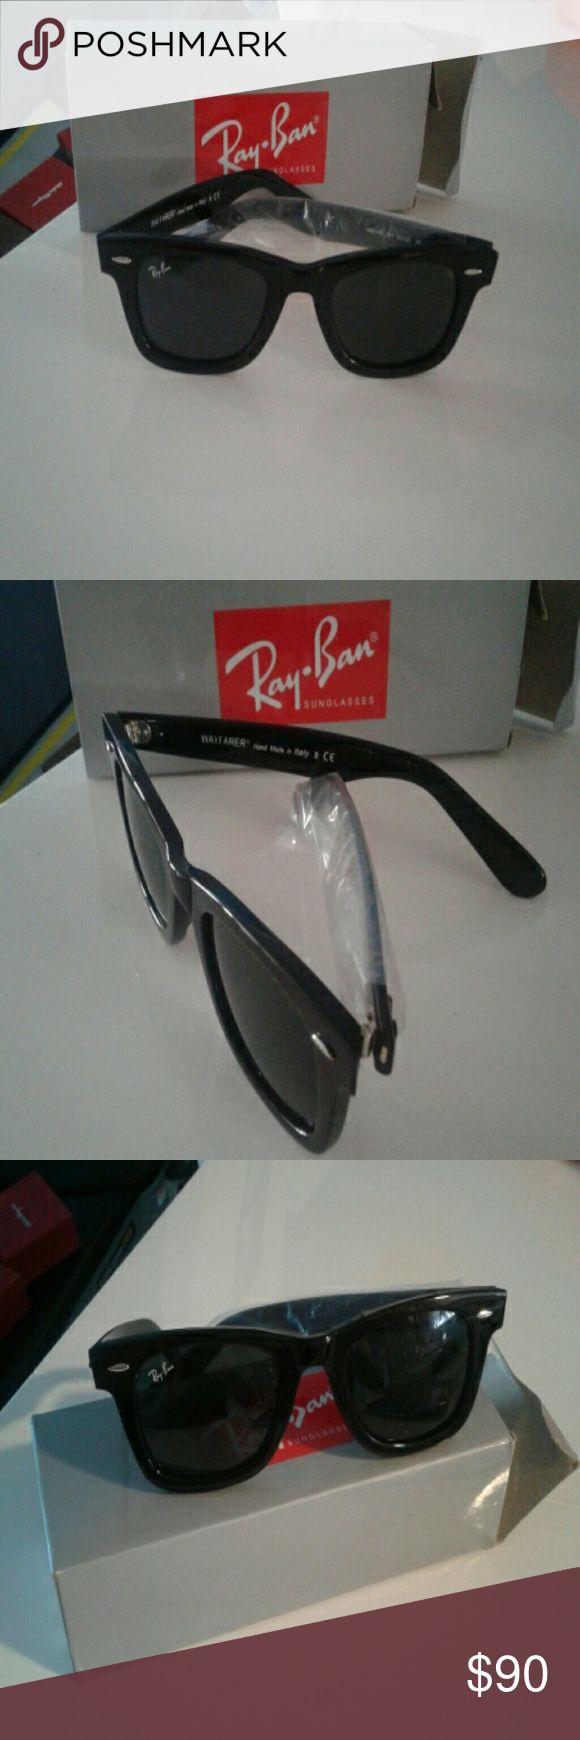 New sunglasses  ray ban  wayfarer Nice black sunglasses  come with  box Ray-Ban Accessories Glasses